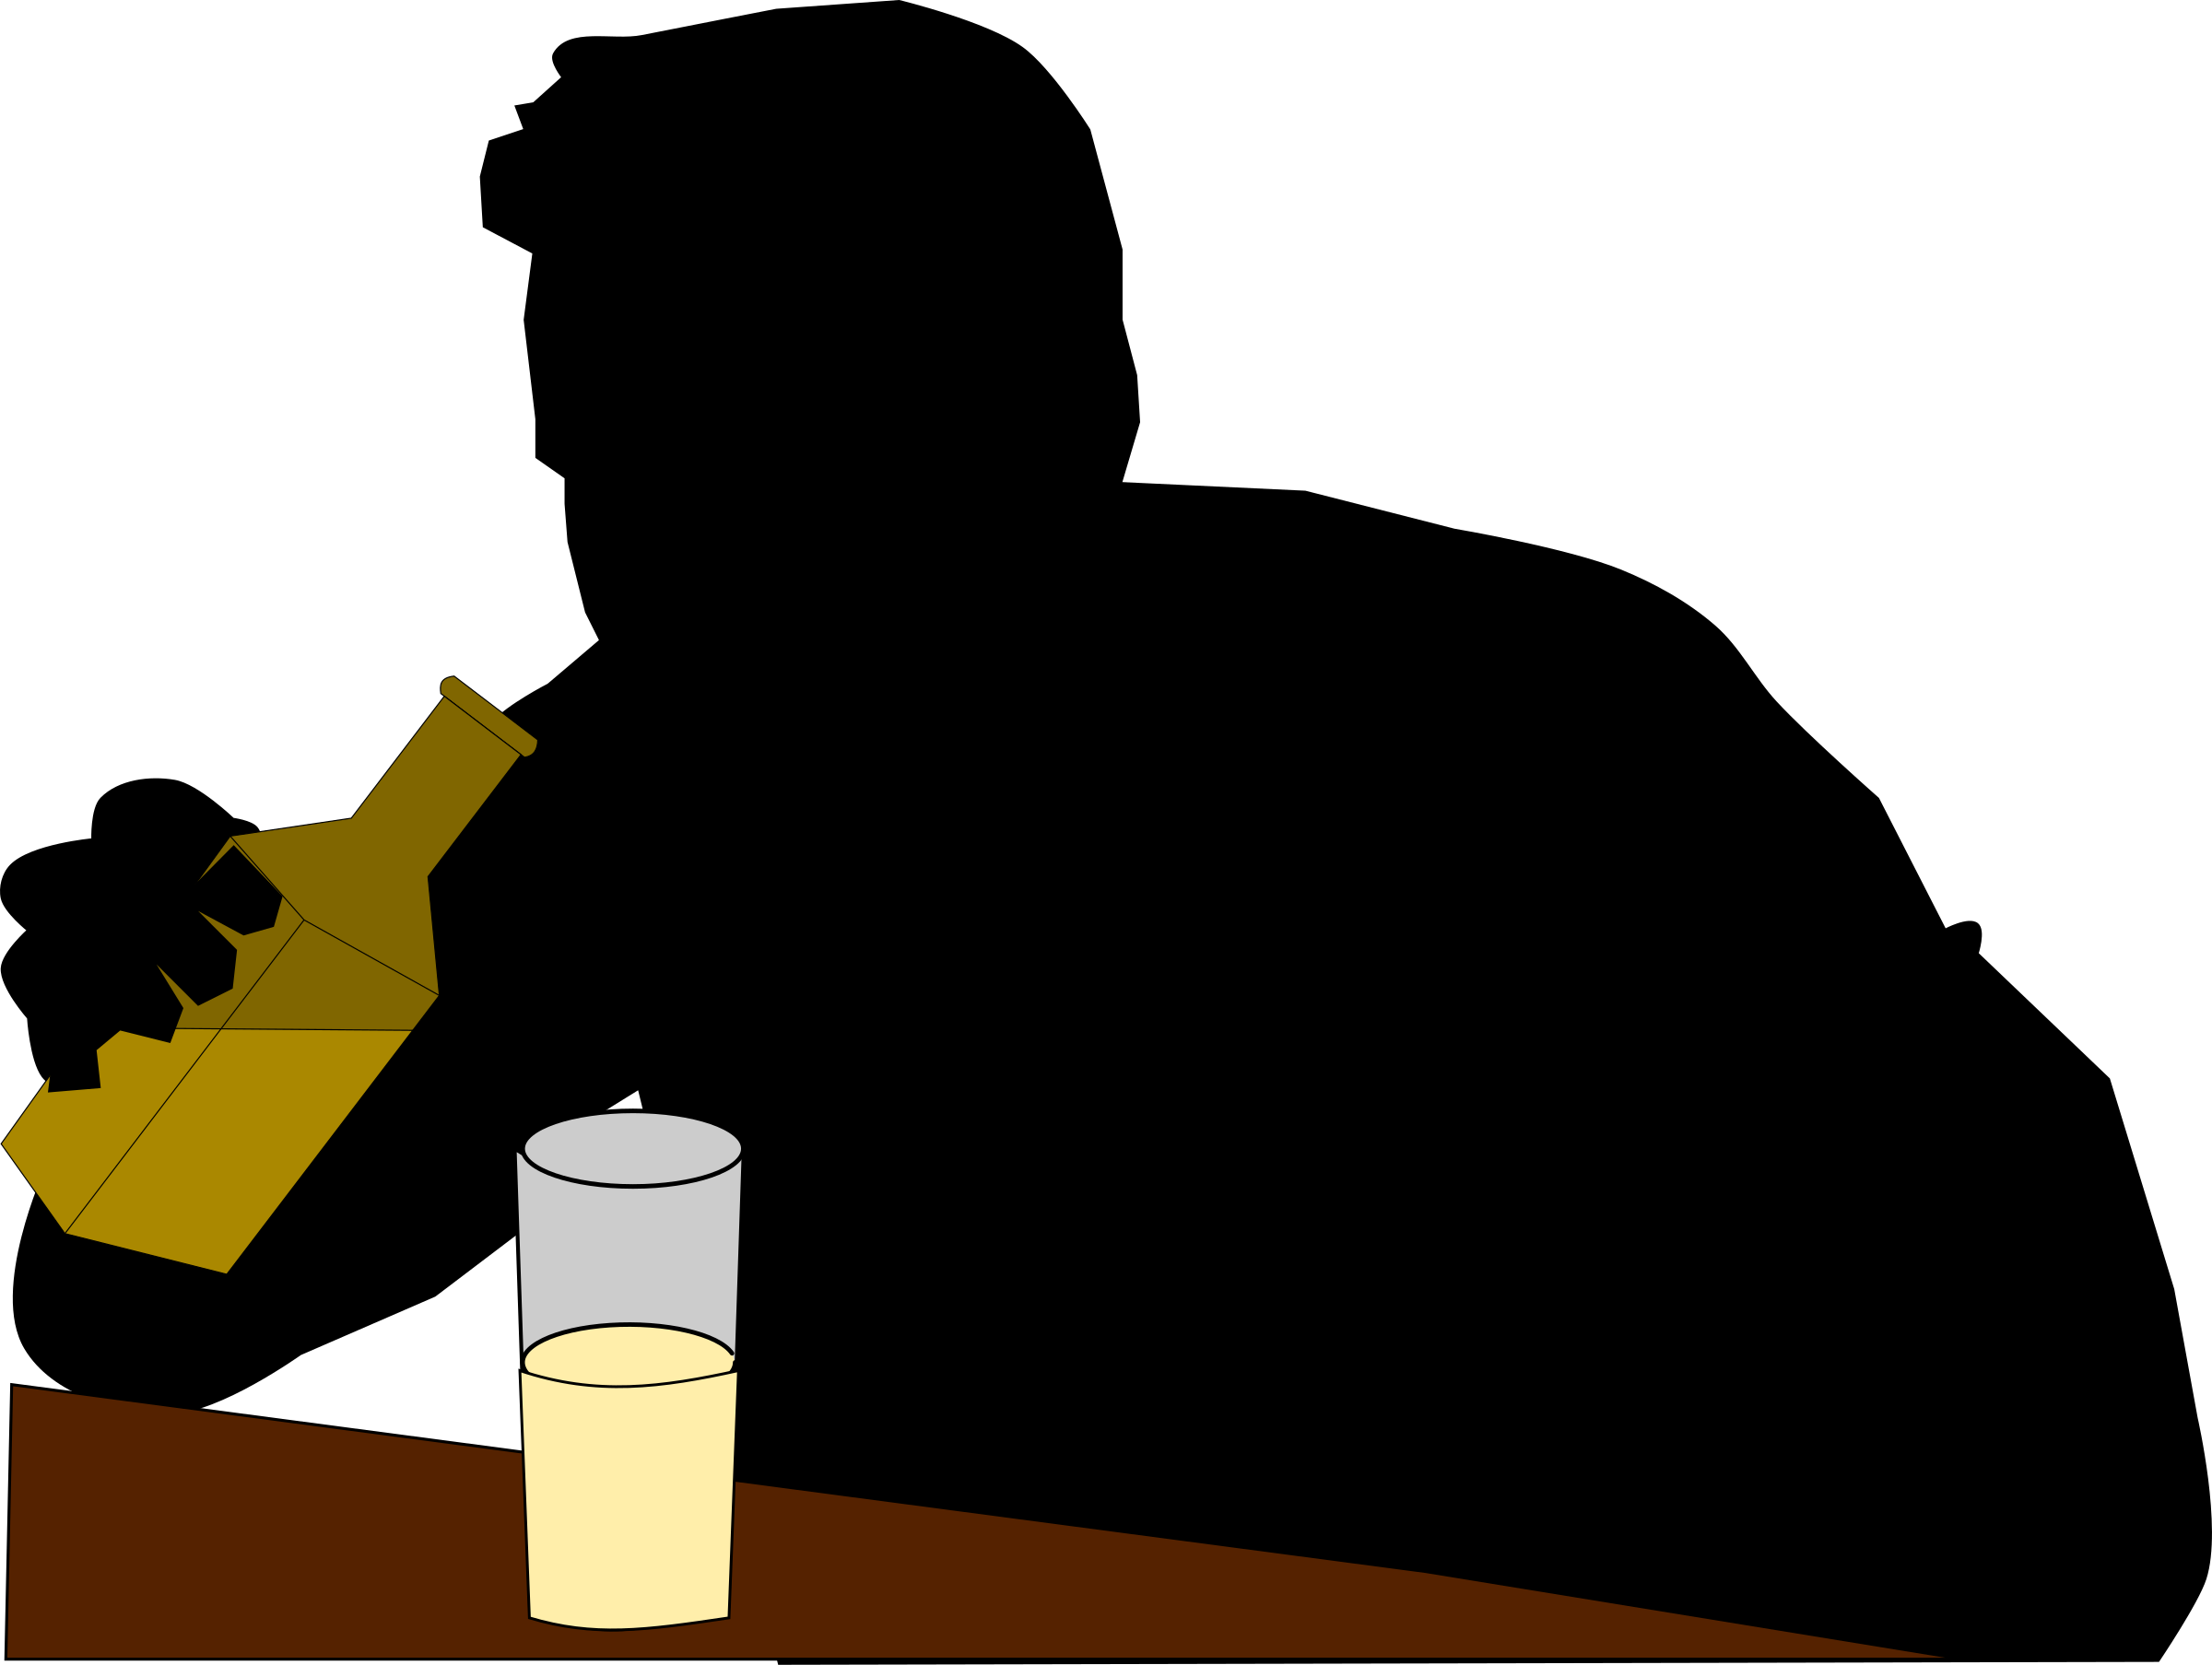 Alcohol clipart transparent Clipart Alcoholic Alcoholic